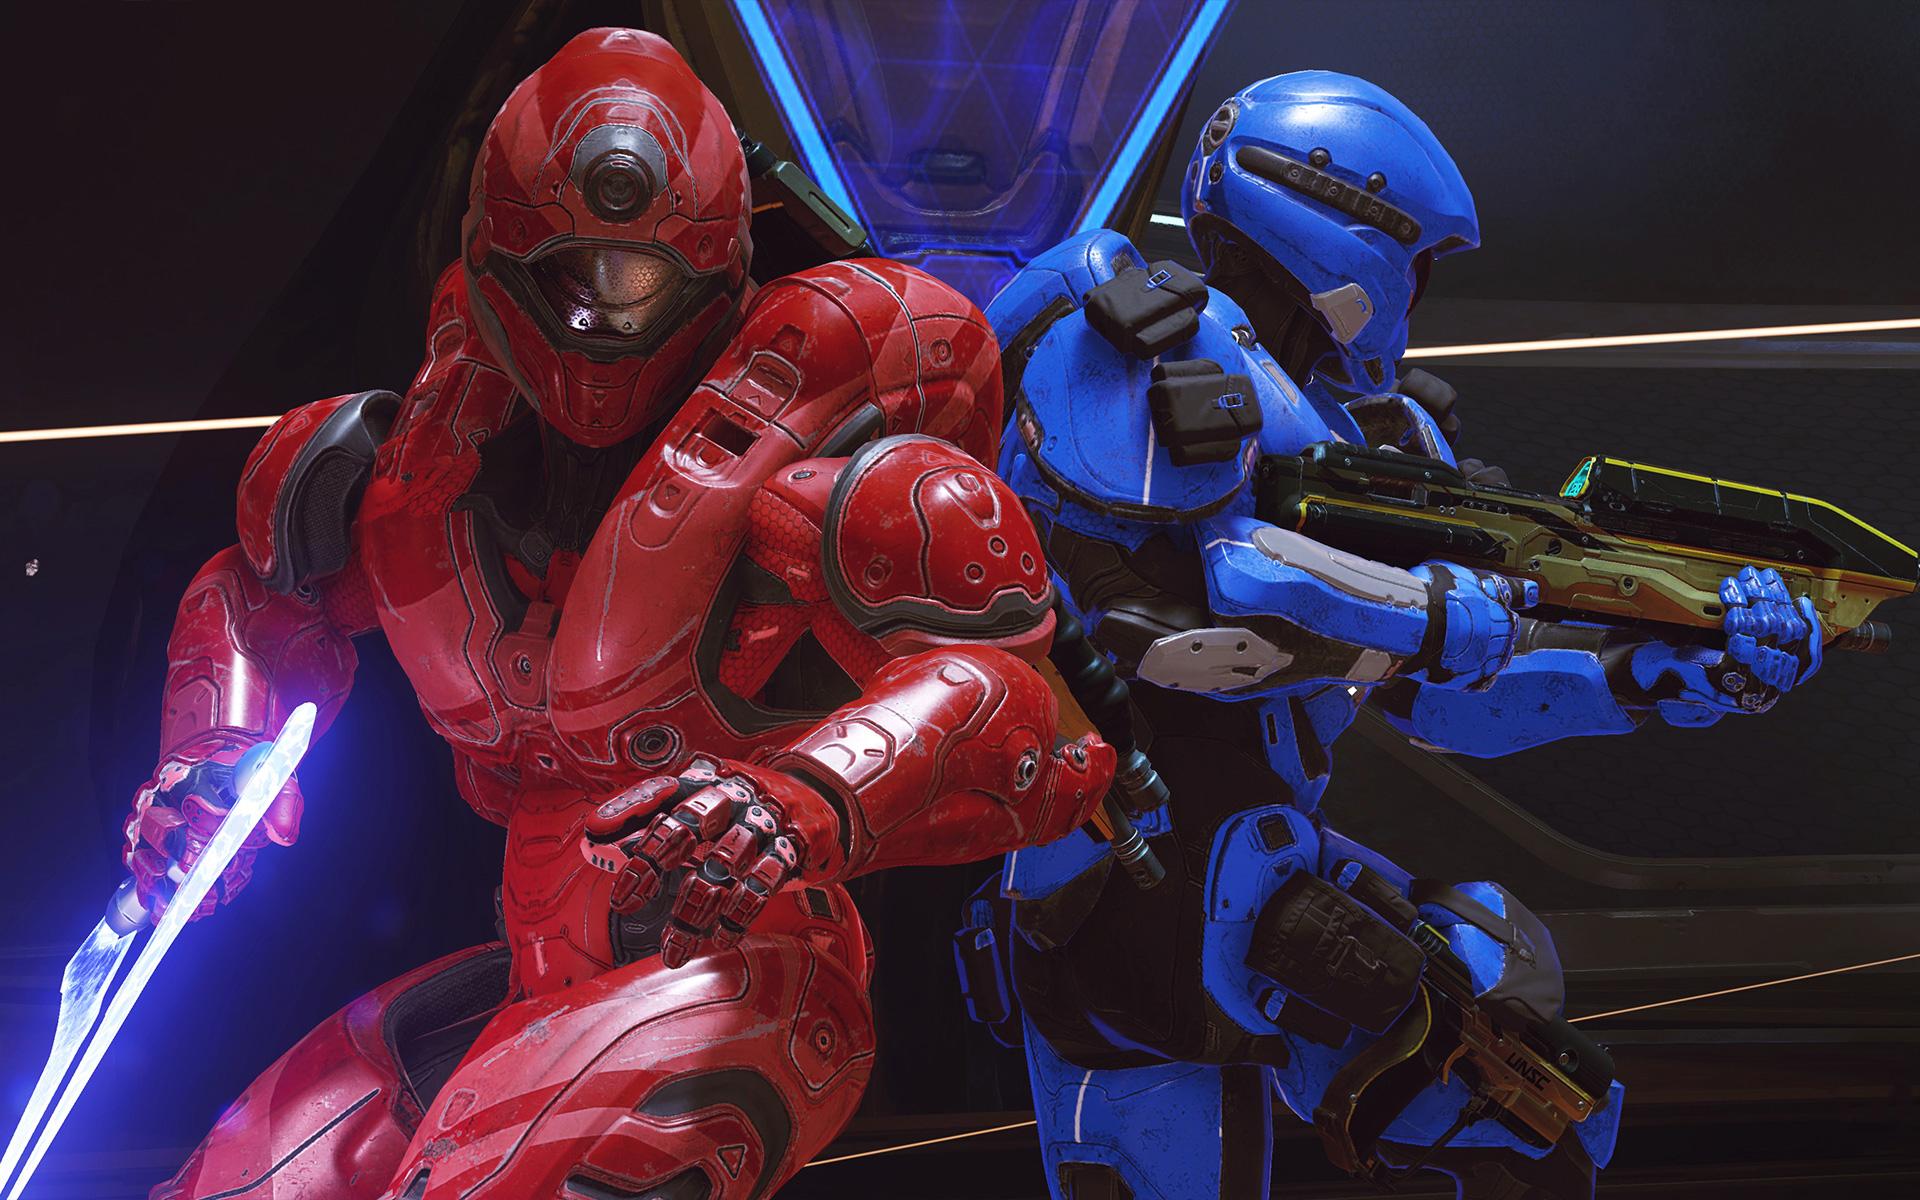 Halo 5: Guardians Wallpaper in 1920x1200